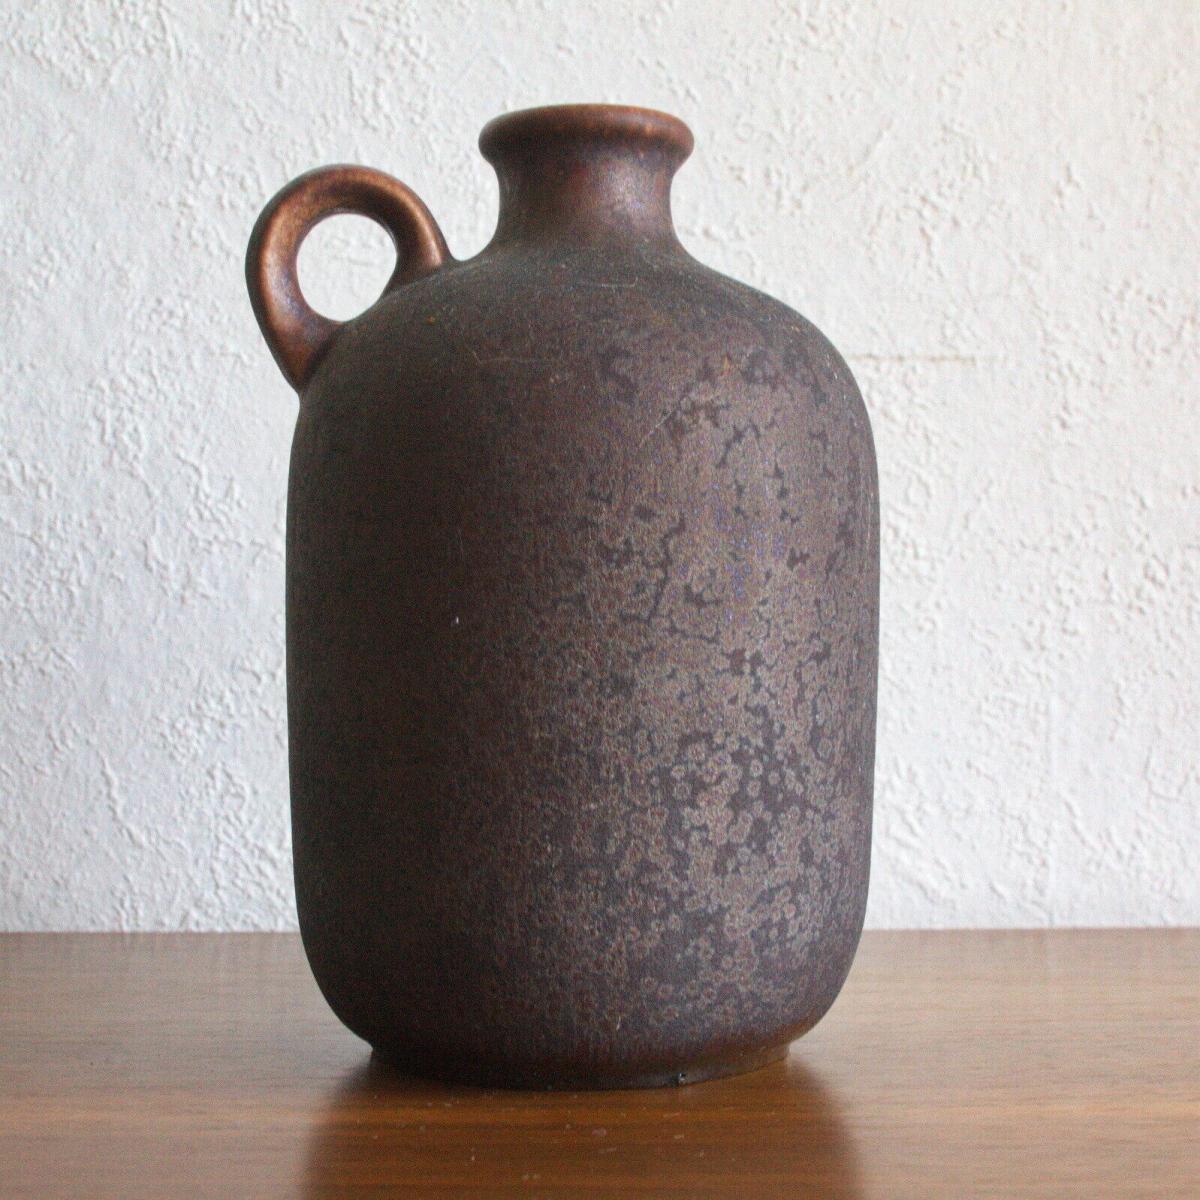 Wohl dänemark krug keramikkrug vase keramik 382 danish design midcentury 60er 0